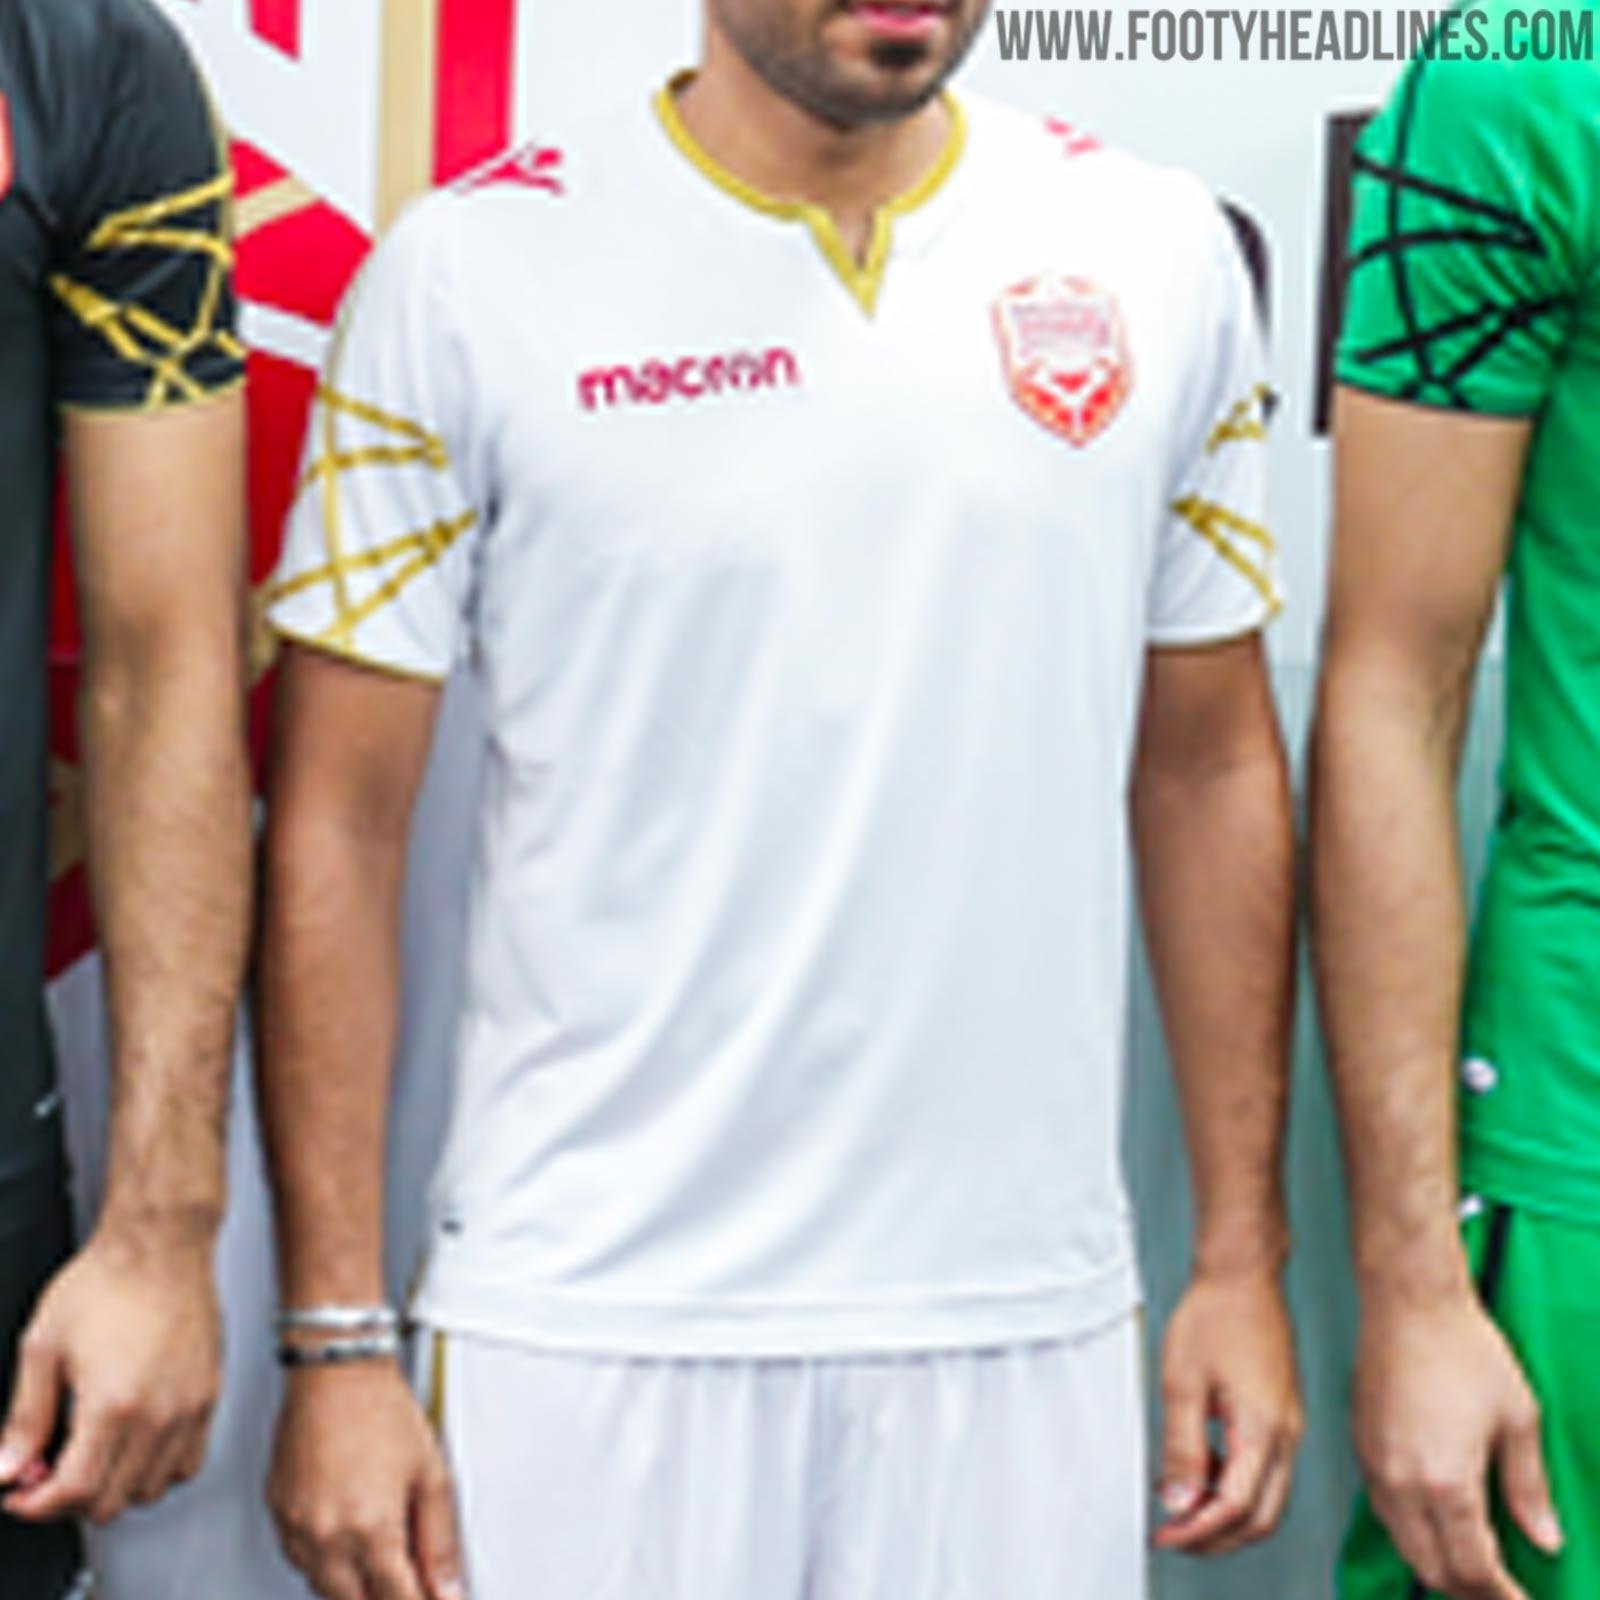 No More Romai - Macron Bahrain 2019-20 Home   Away Kits Released ... 0b3850af3